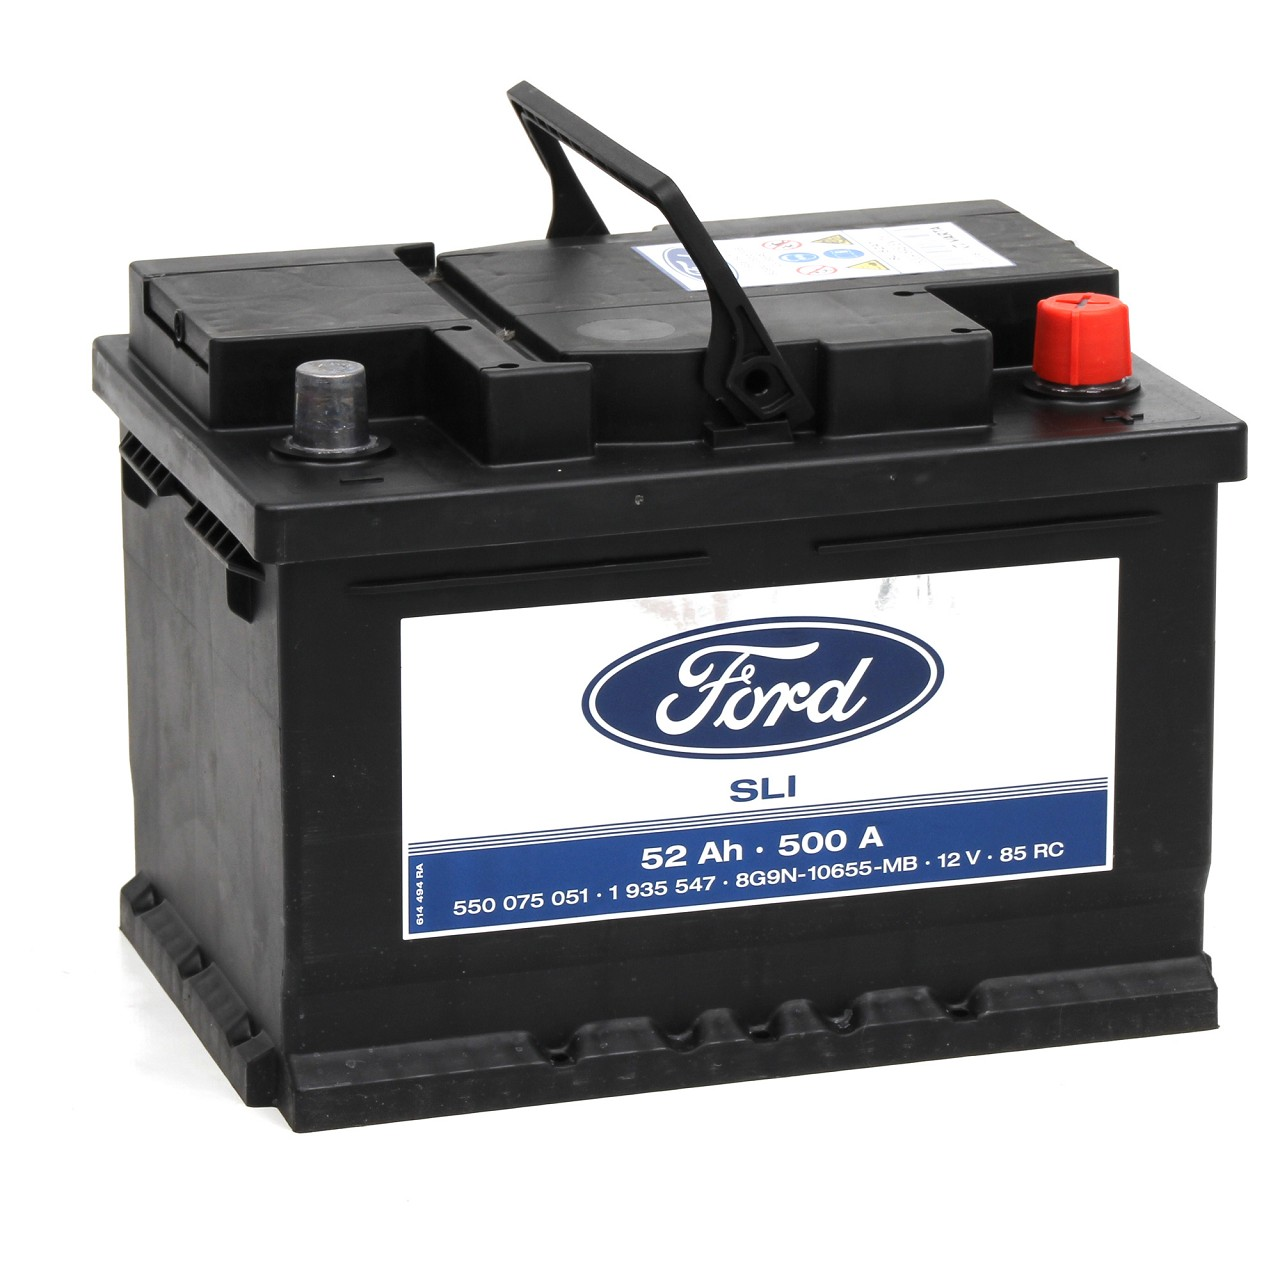 ORIGINAL Ford Autobatterie Batterie Starterbatterie 12V 52Ah 500A 1935547